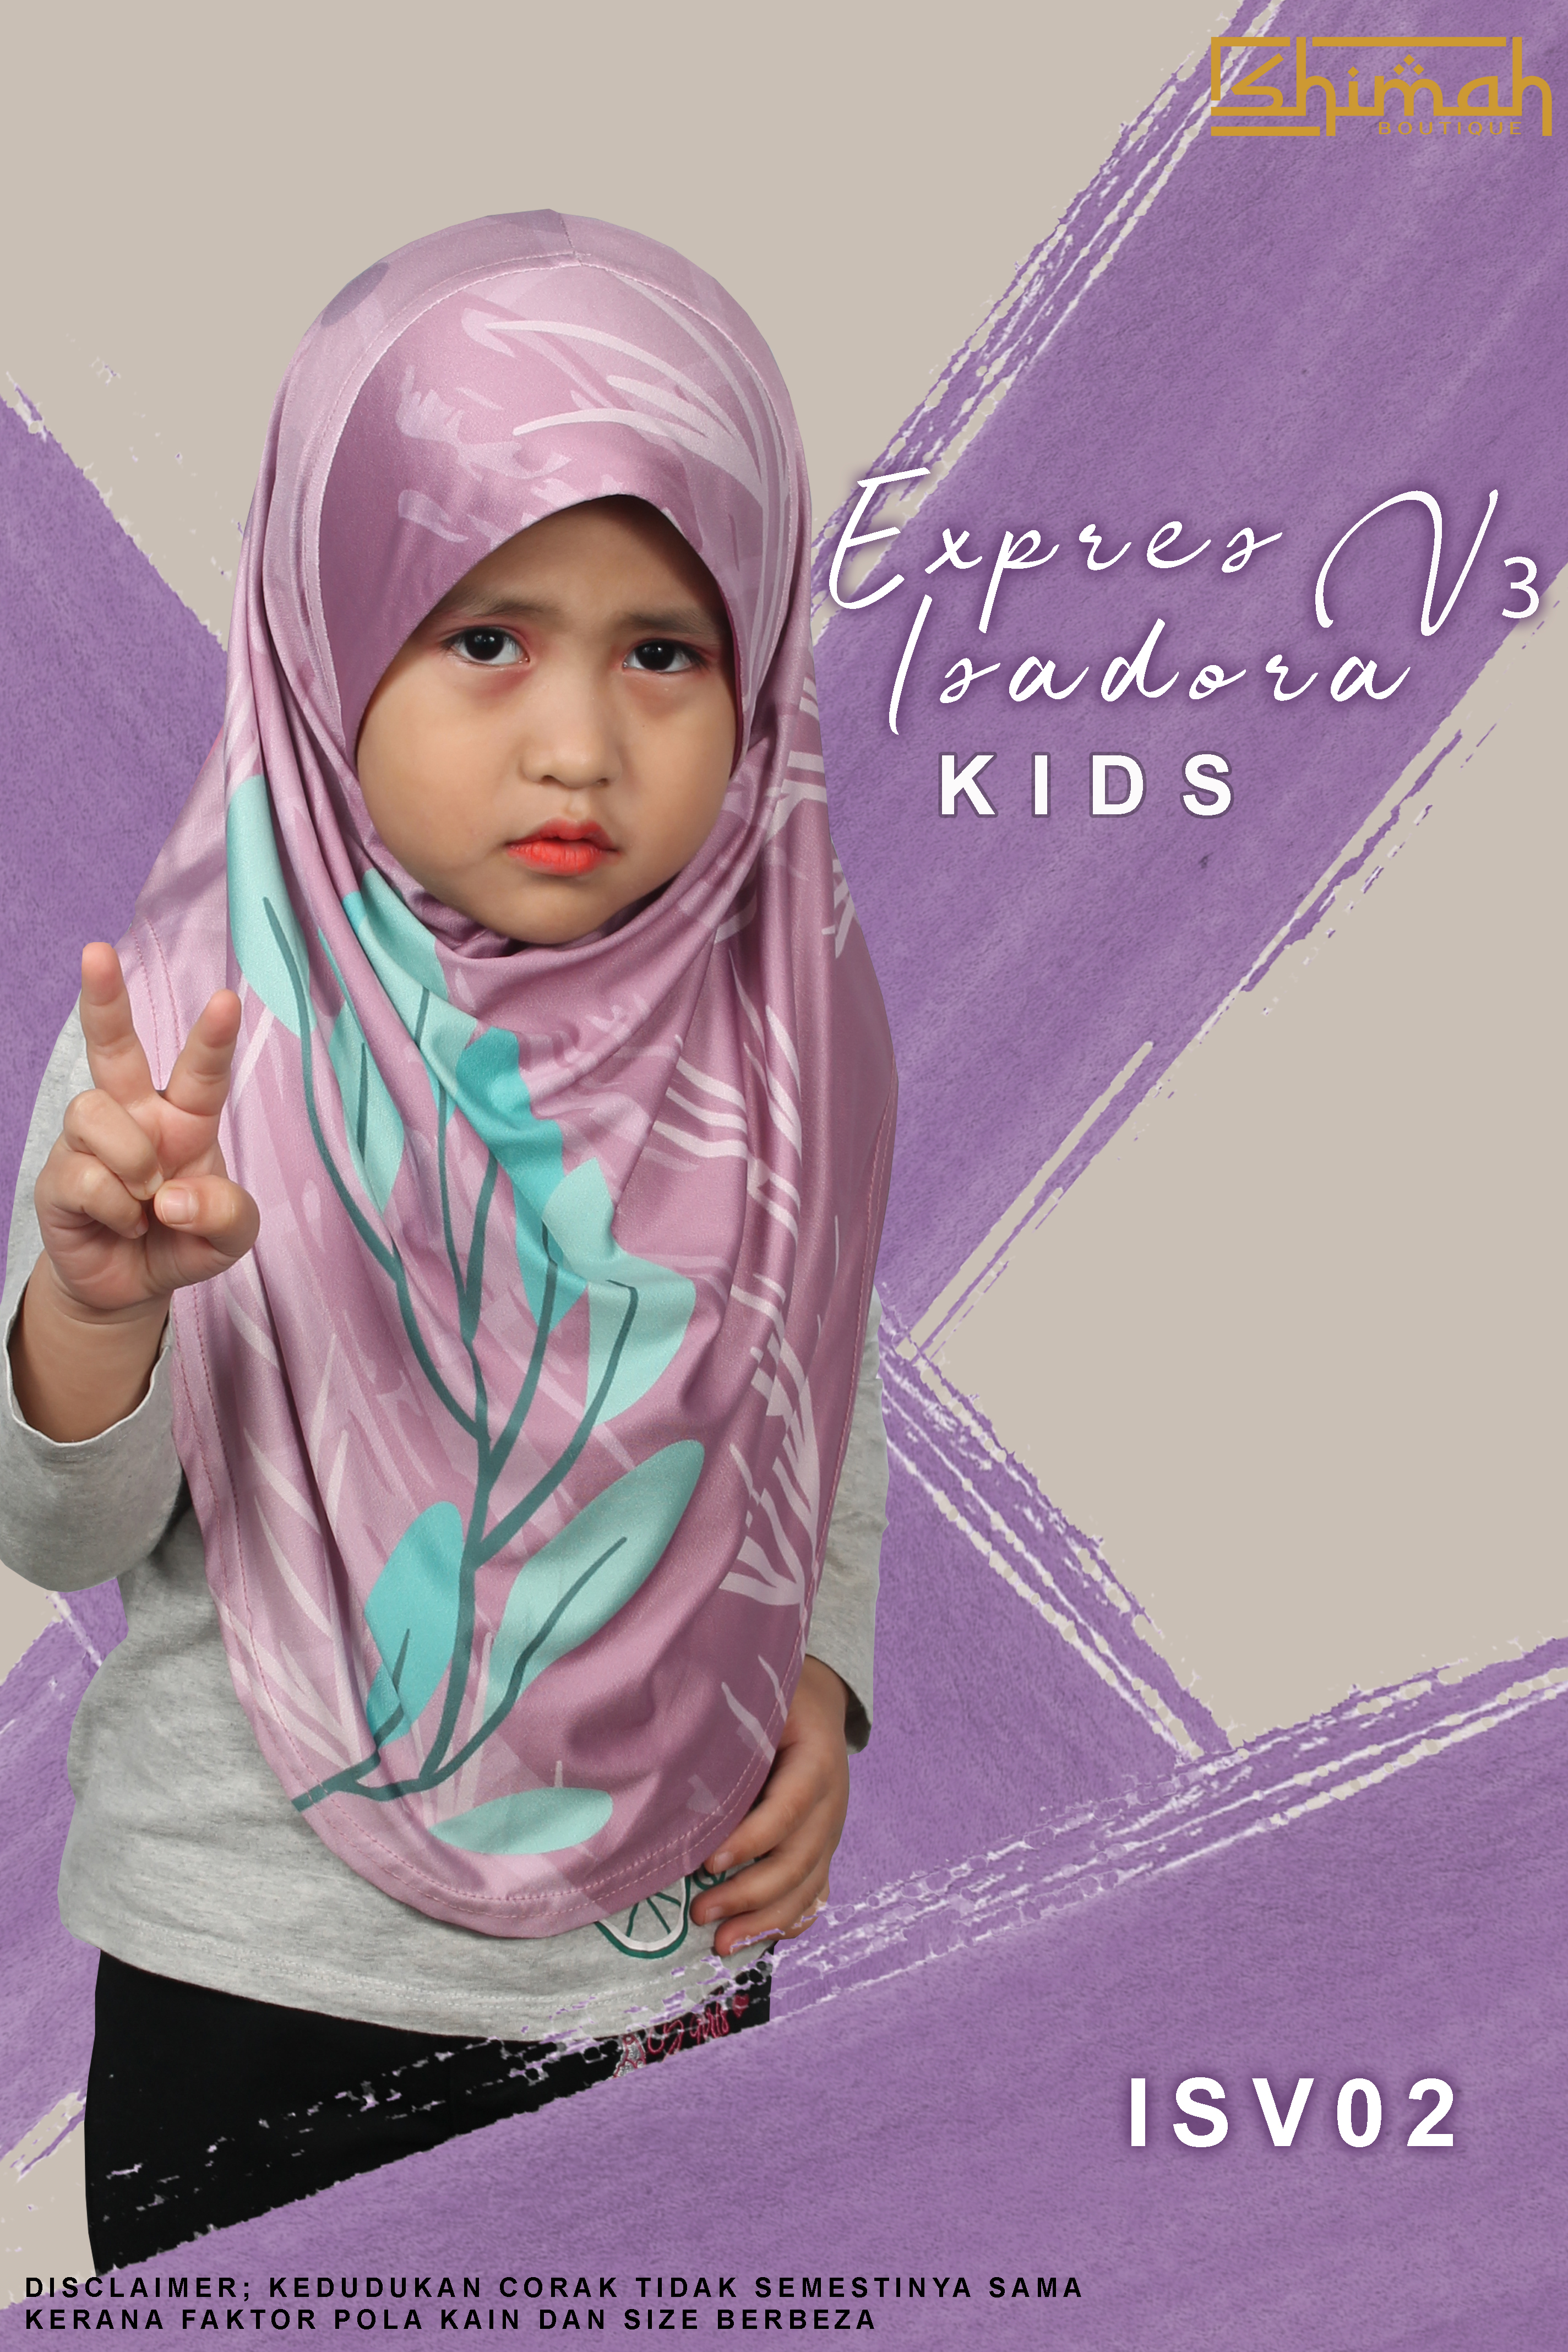 Express Isadora Kids V3 - ISKV02